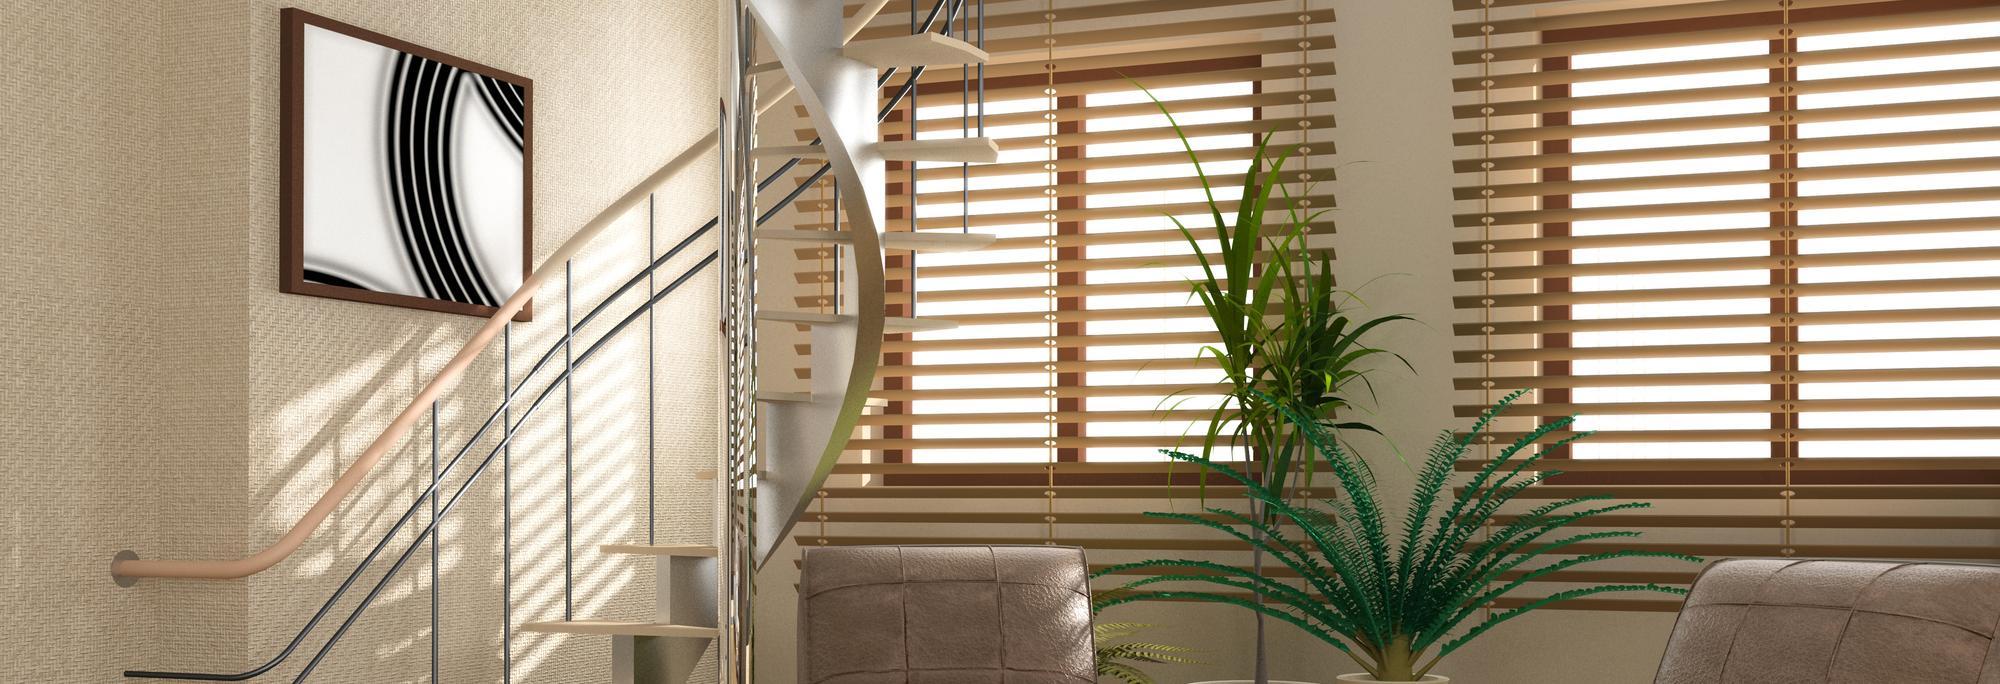 the blind factory wooden window blinds mariemont ohio